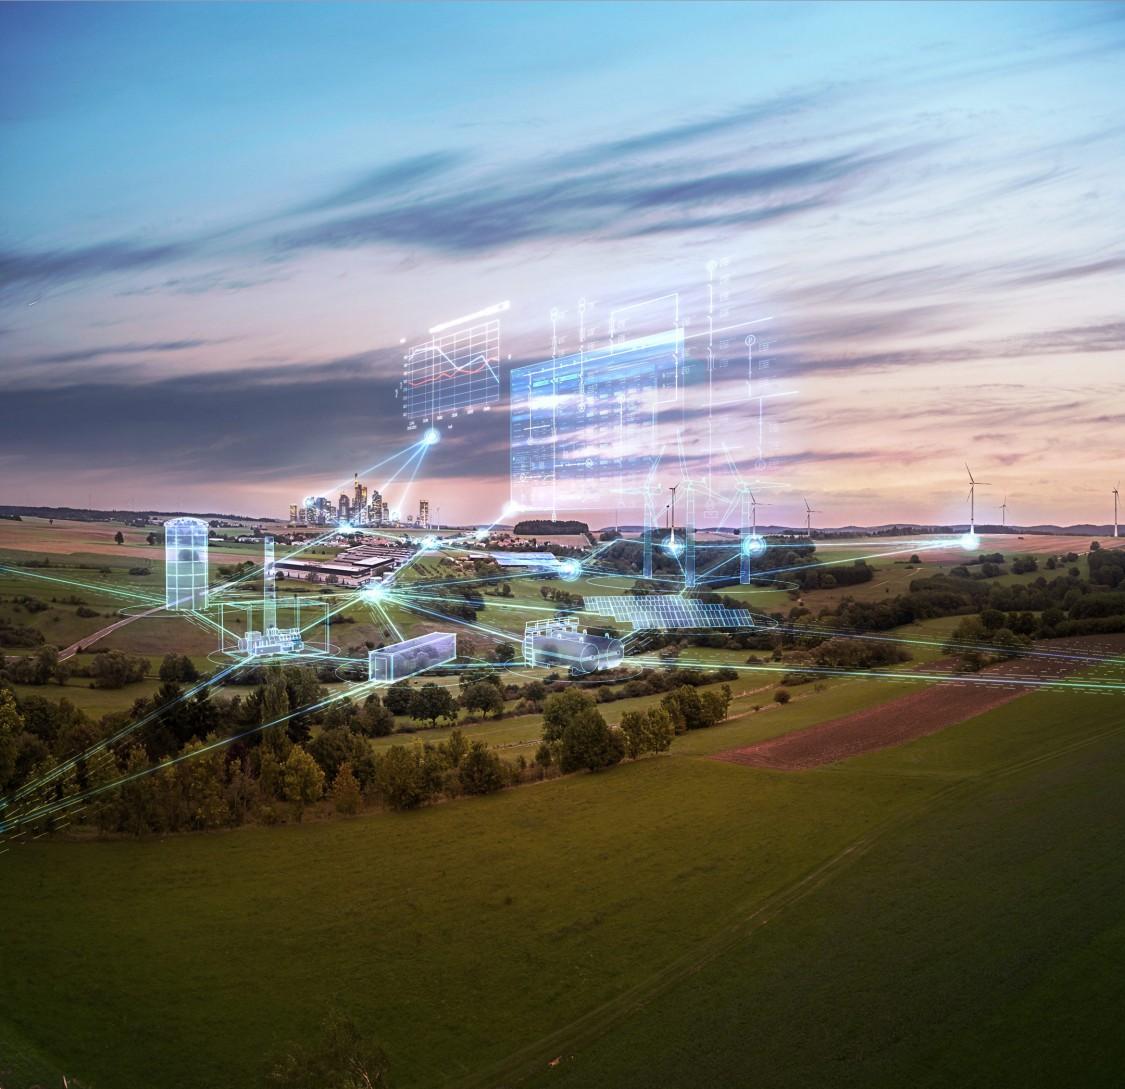 Siemens energy with digital overlay image